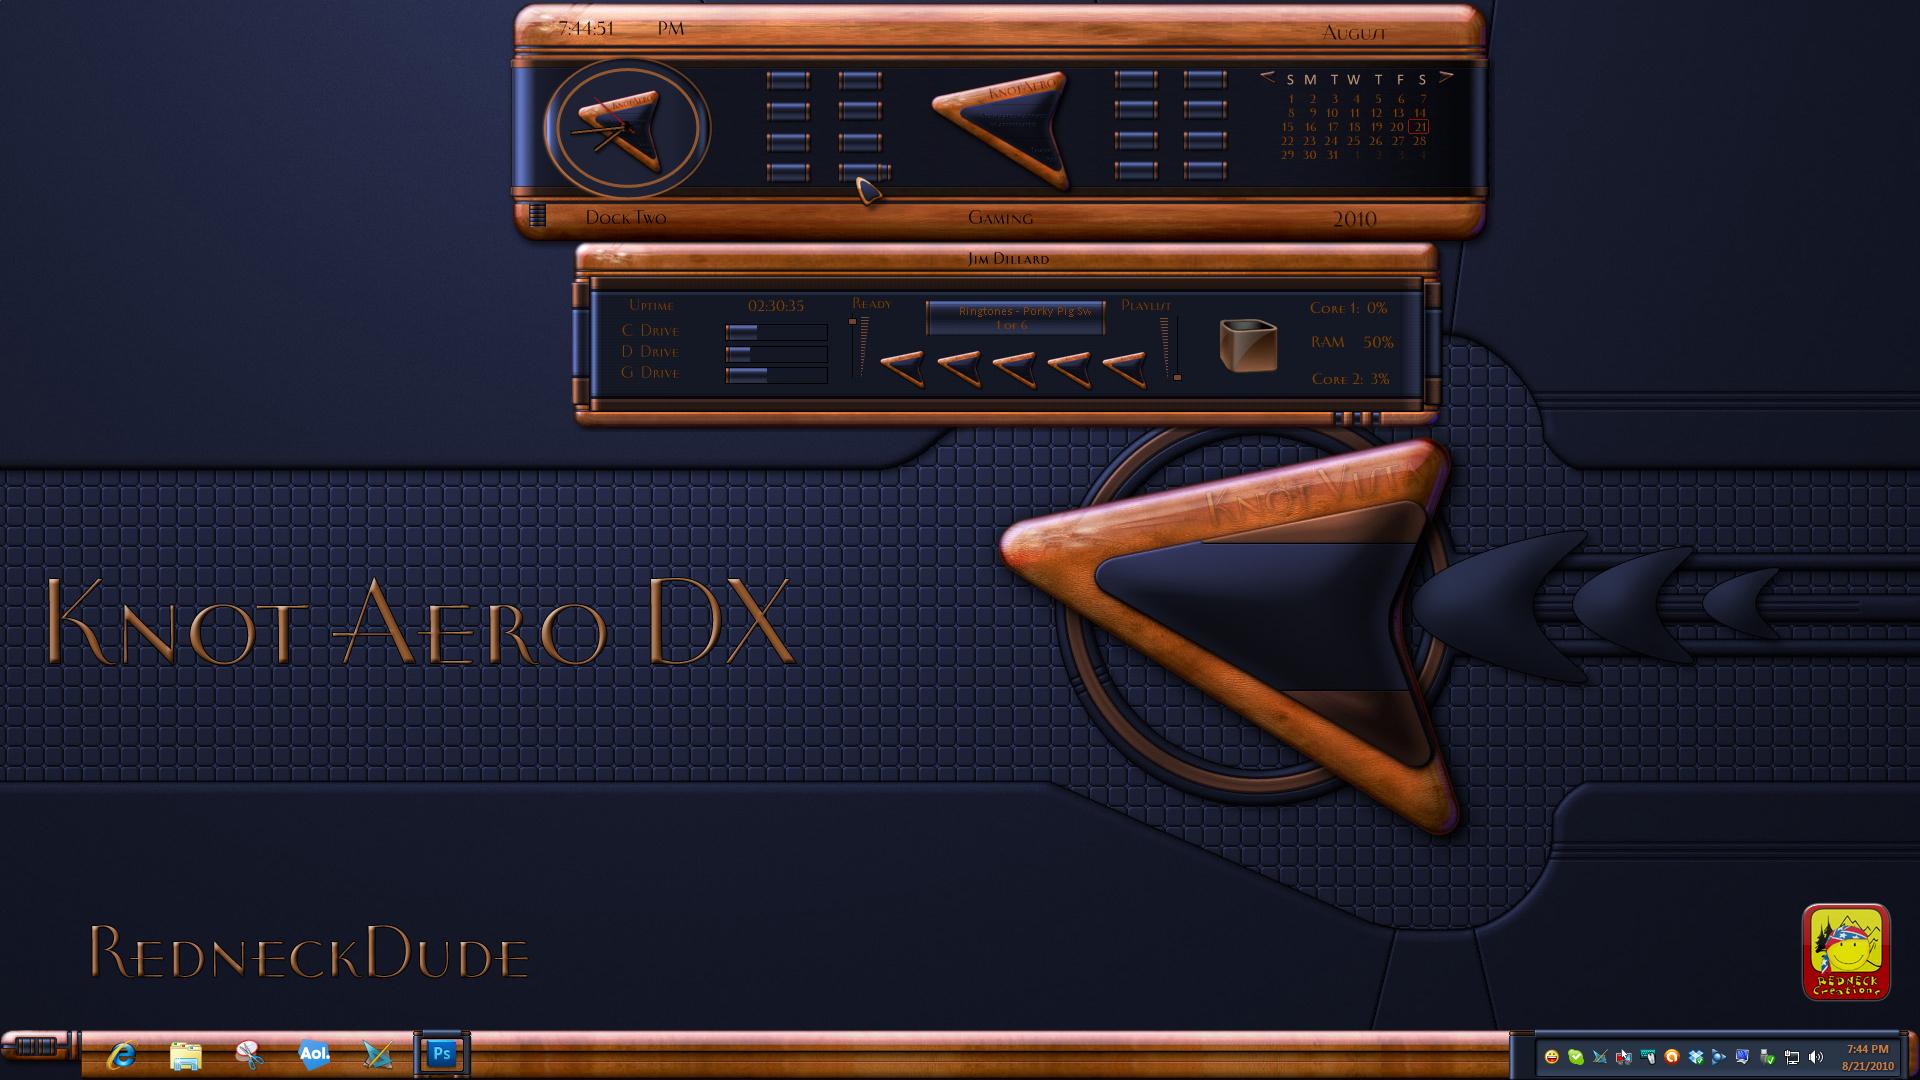 Knot Aero DX